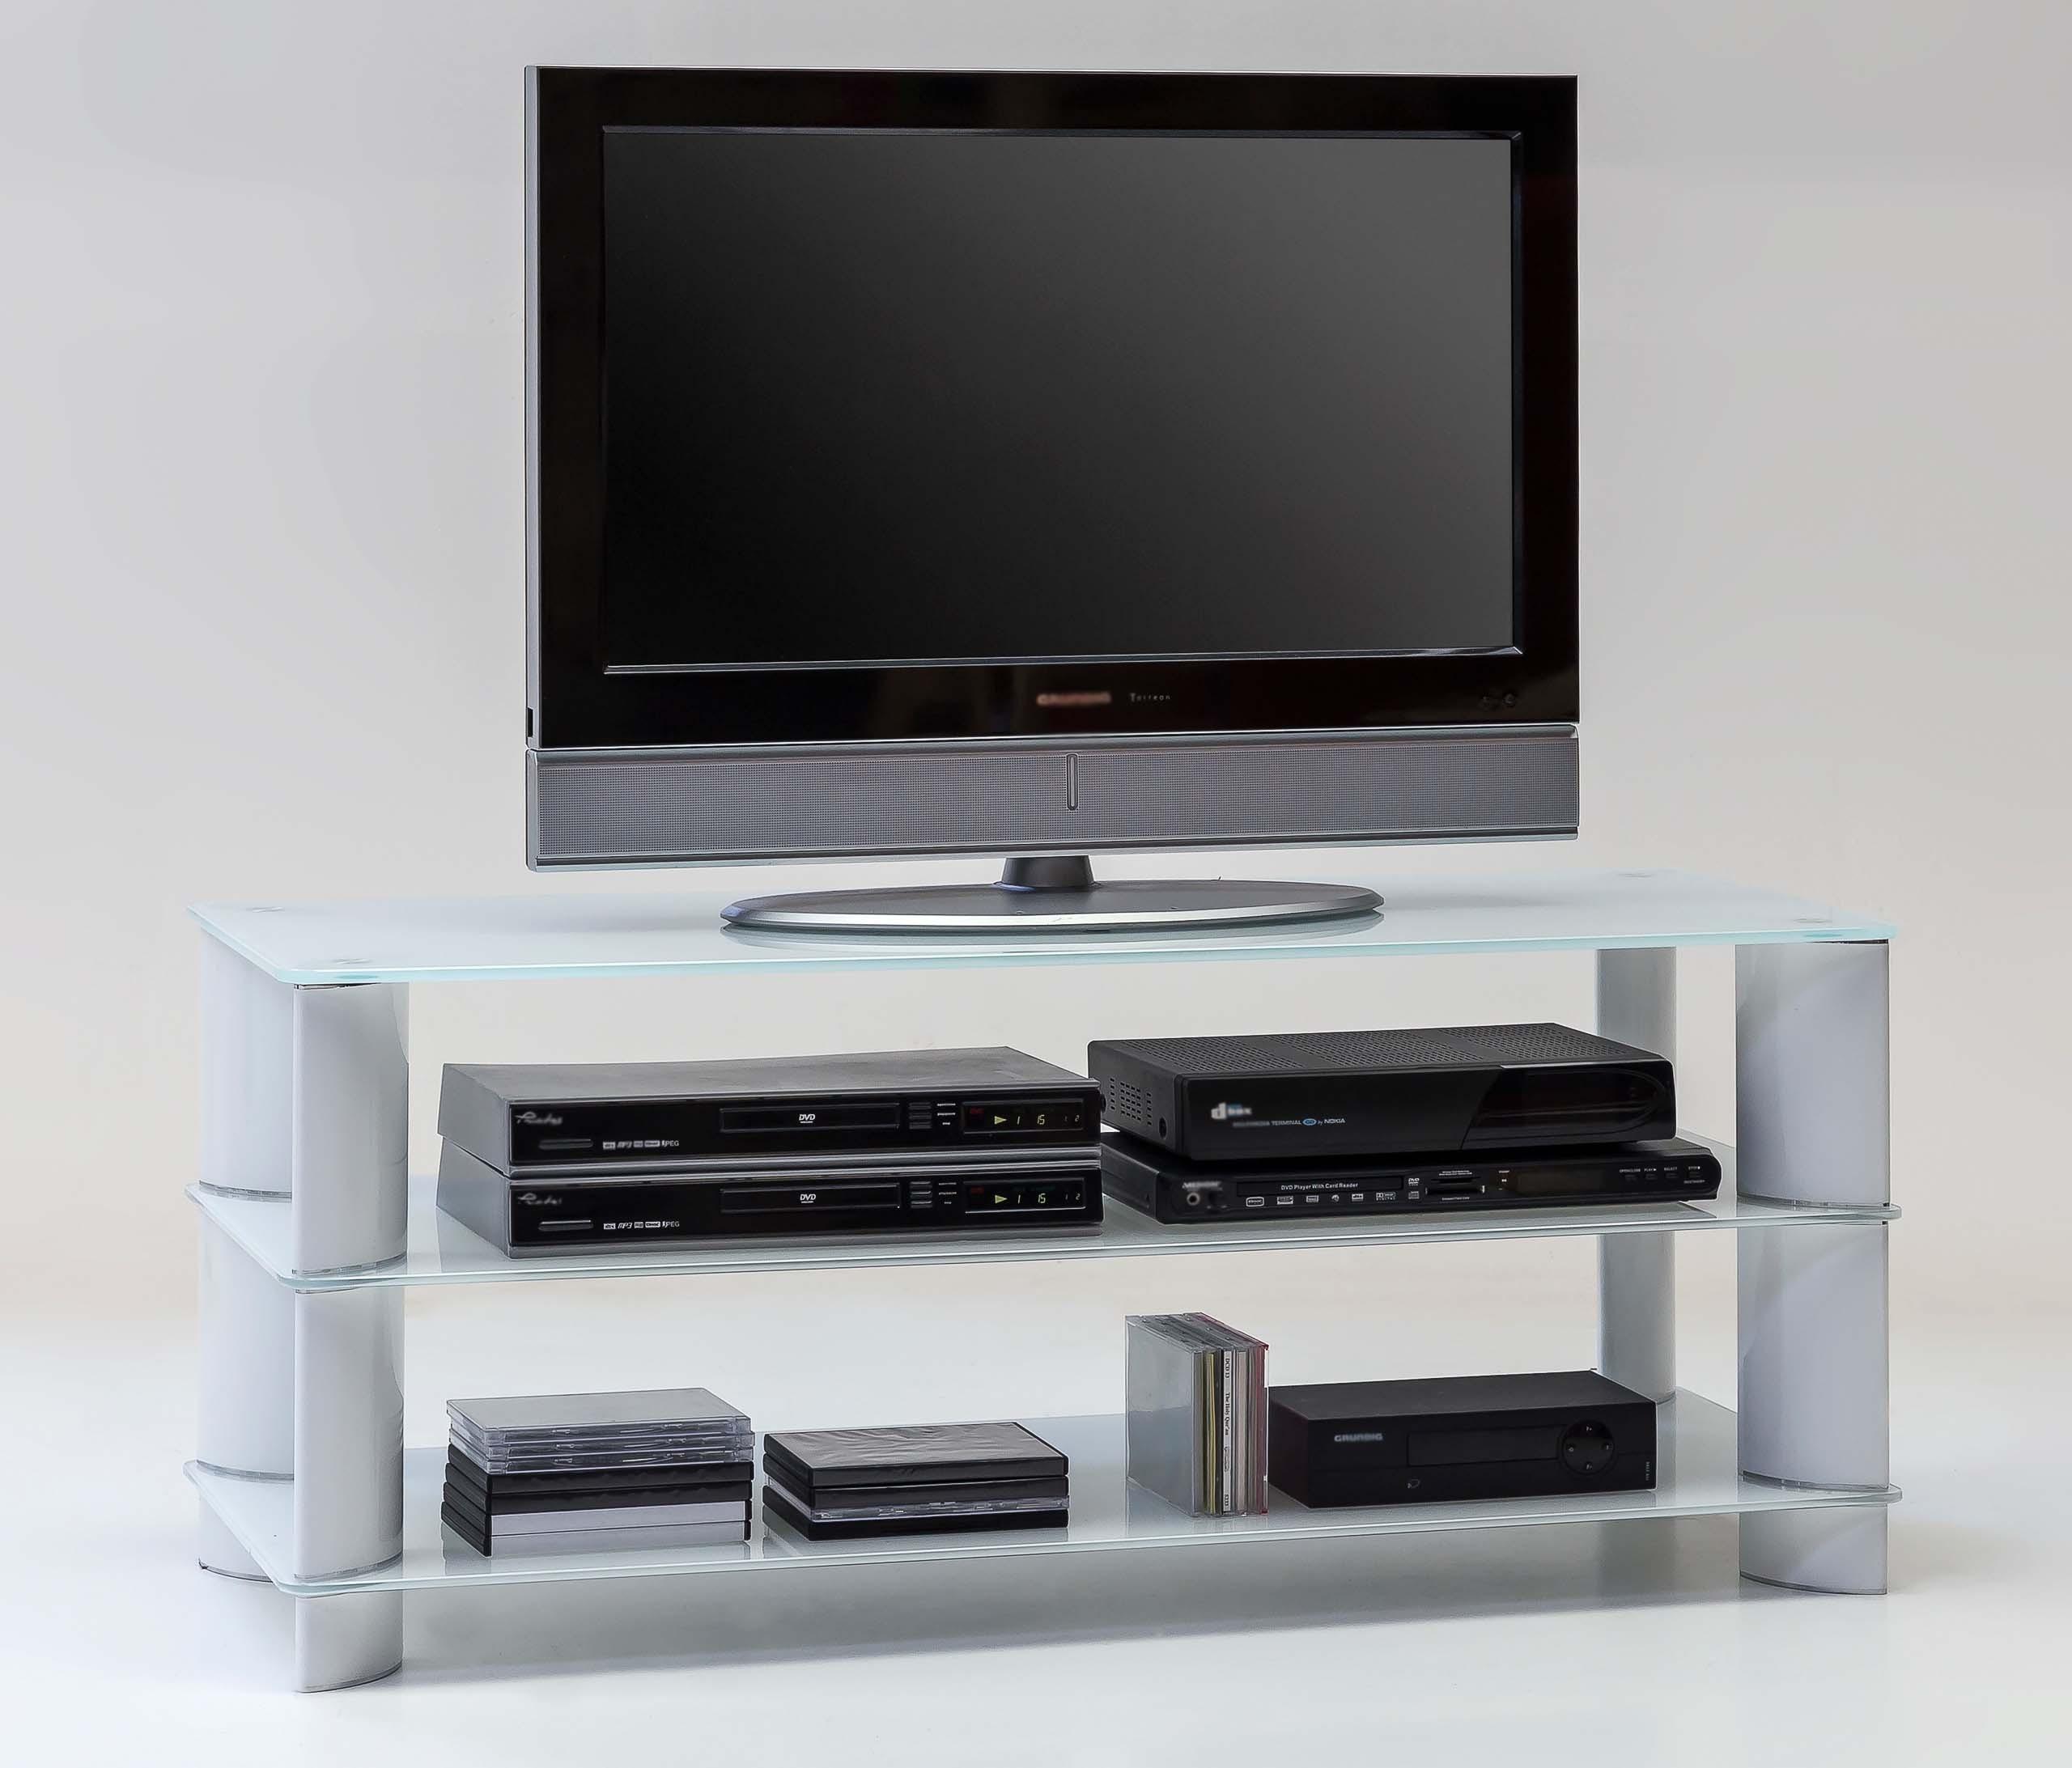 Tv Hifi Ablage Lowboard Weiss Glas Hochglanz Tv688 H C Mobel